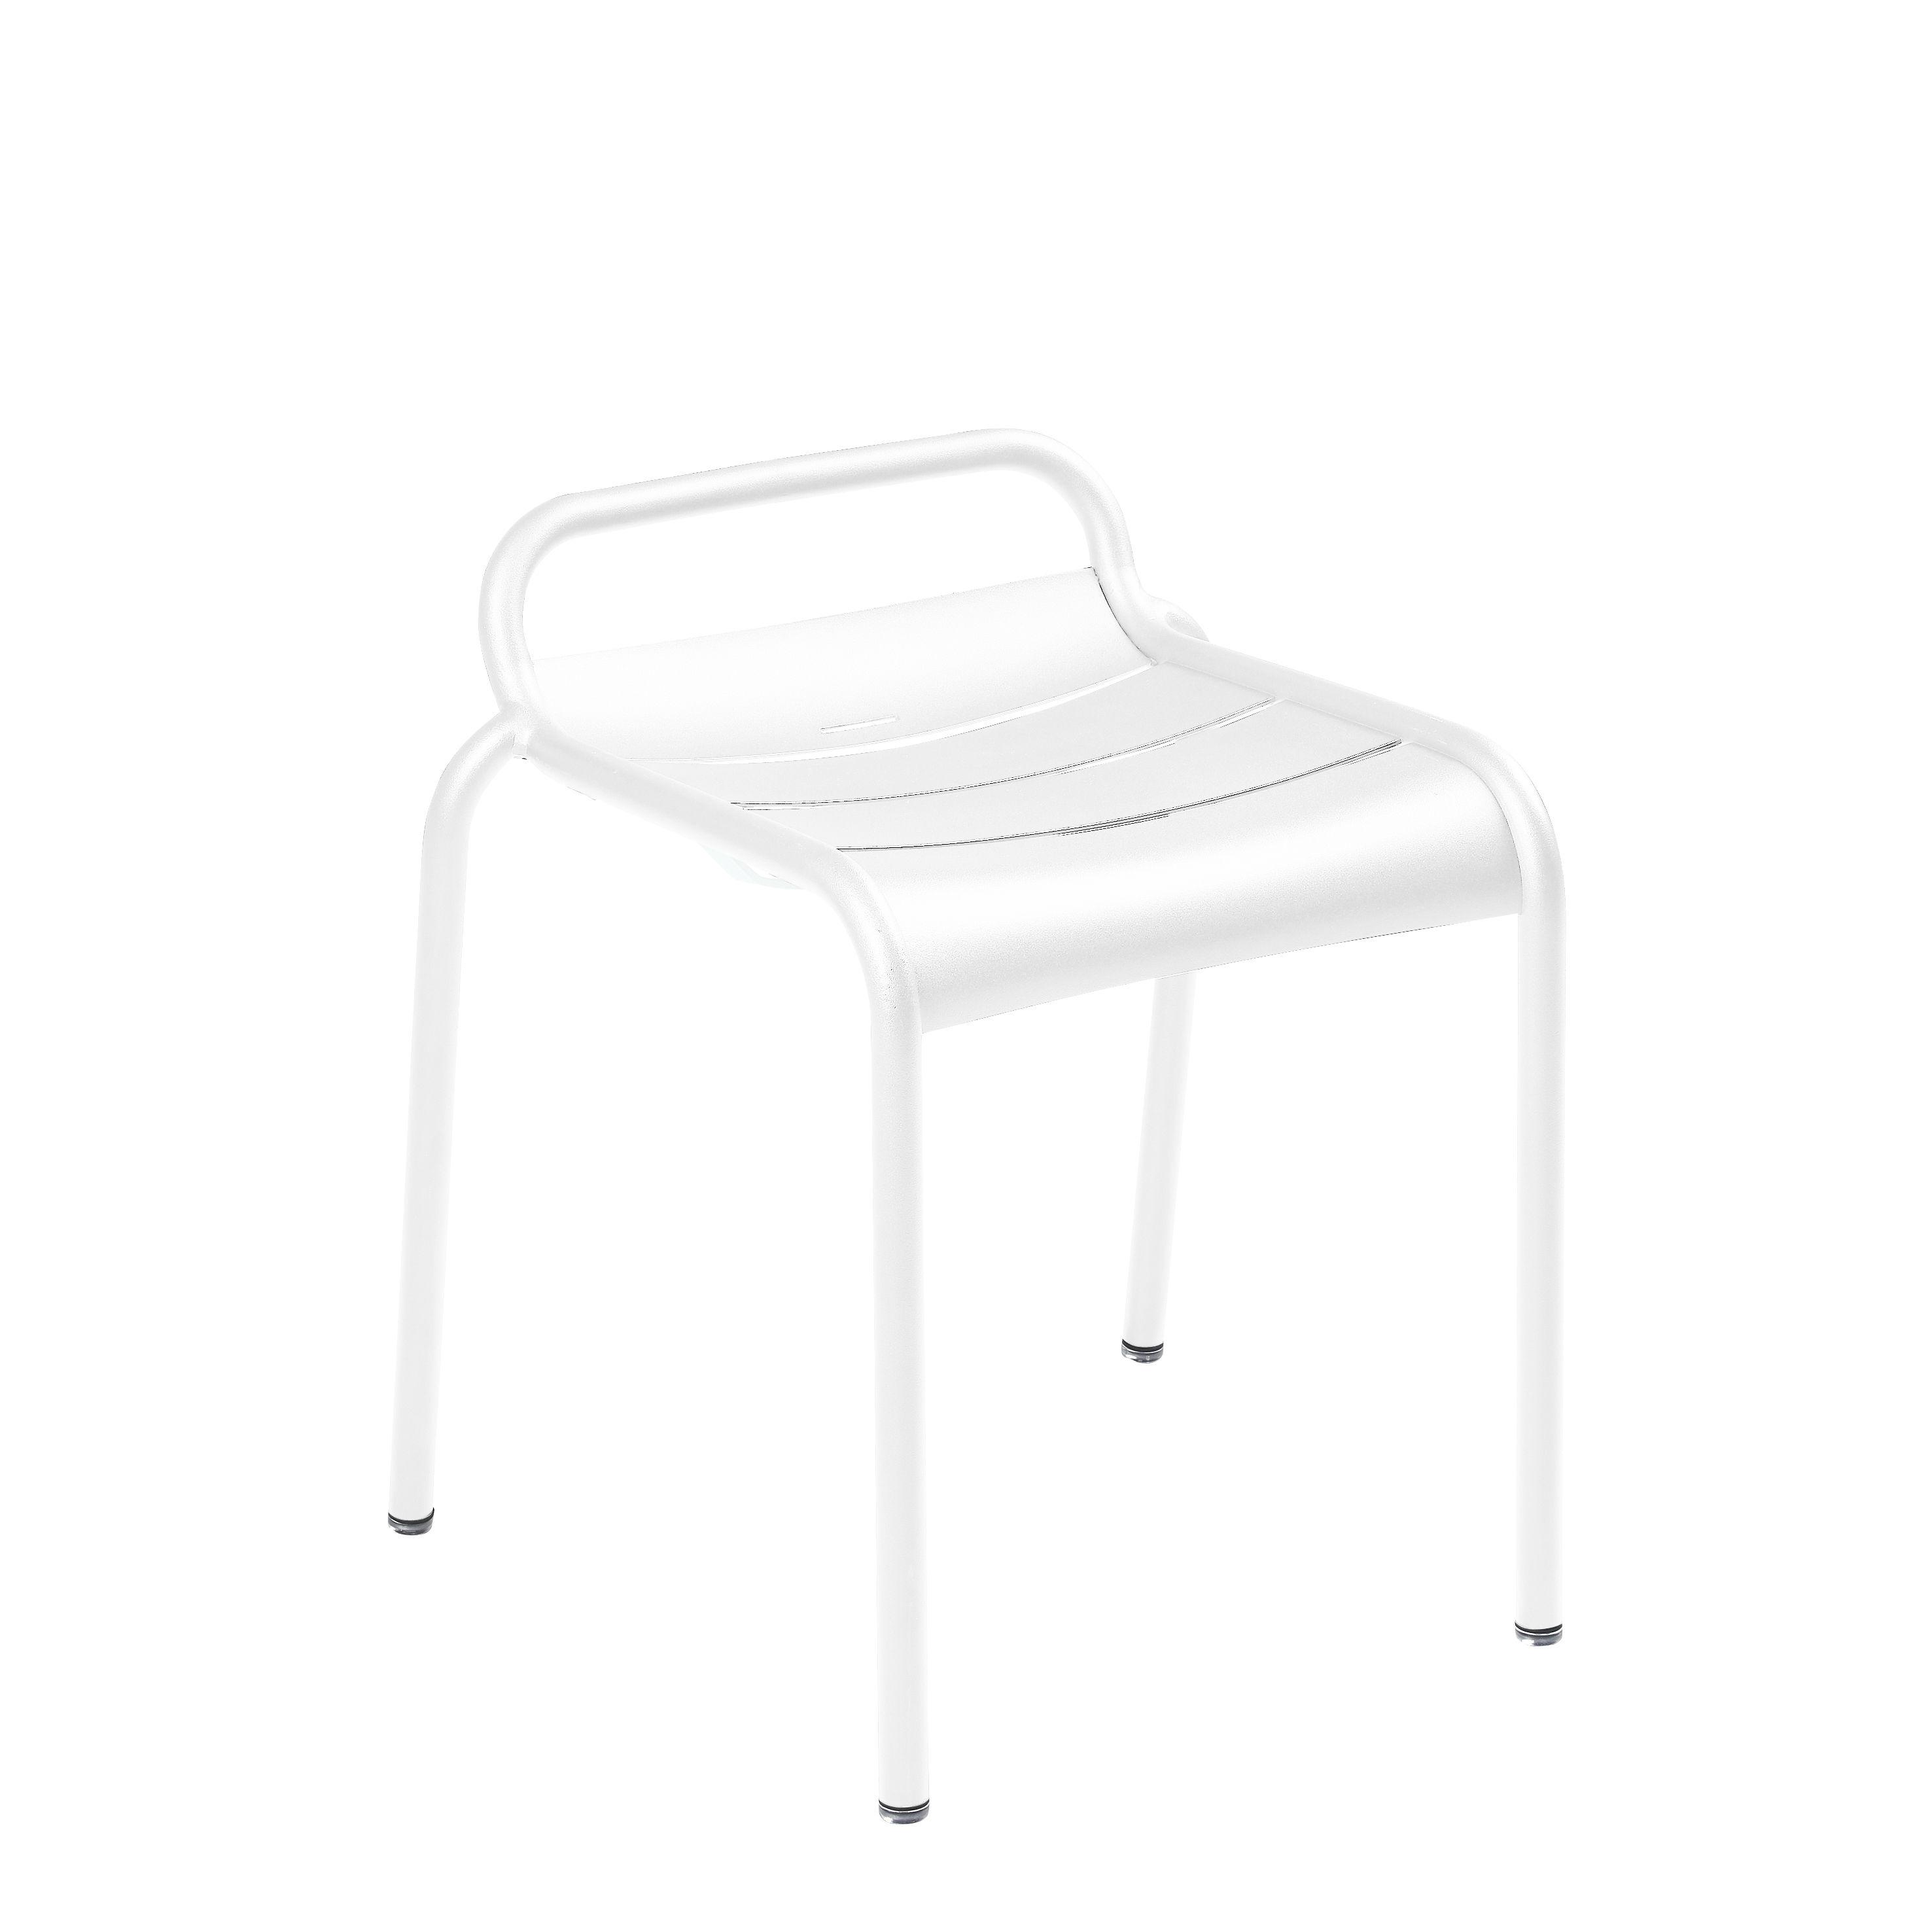 Möbel - Hocker - Luxembourg Stappelbarer Hocker / Aluminium - Fermob - Baumwollweiß - bemaltes Aluminium